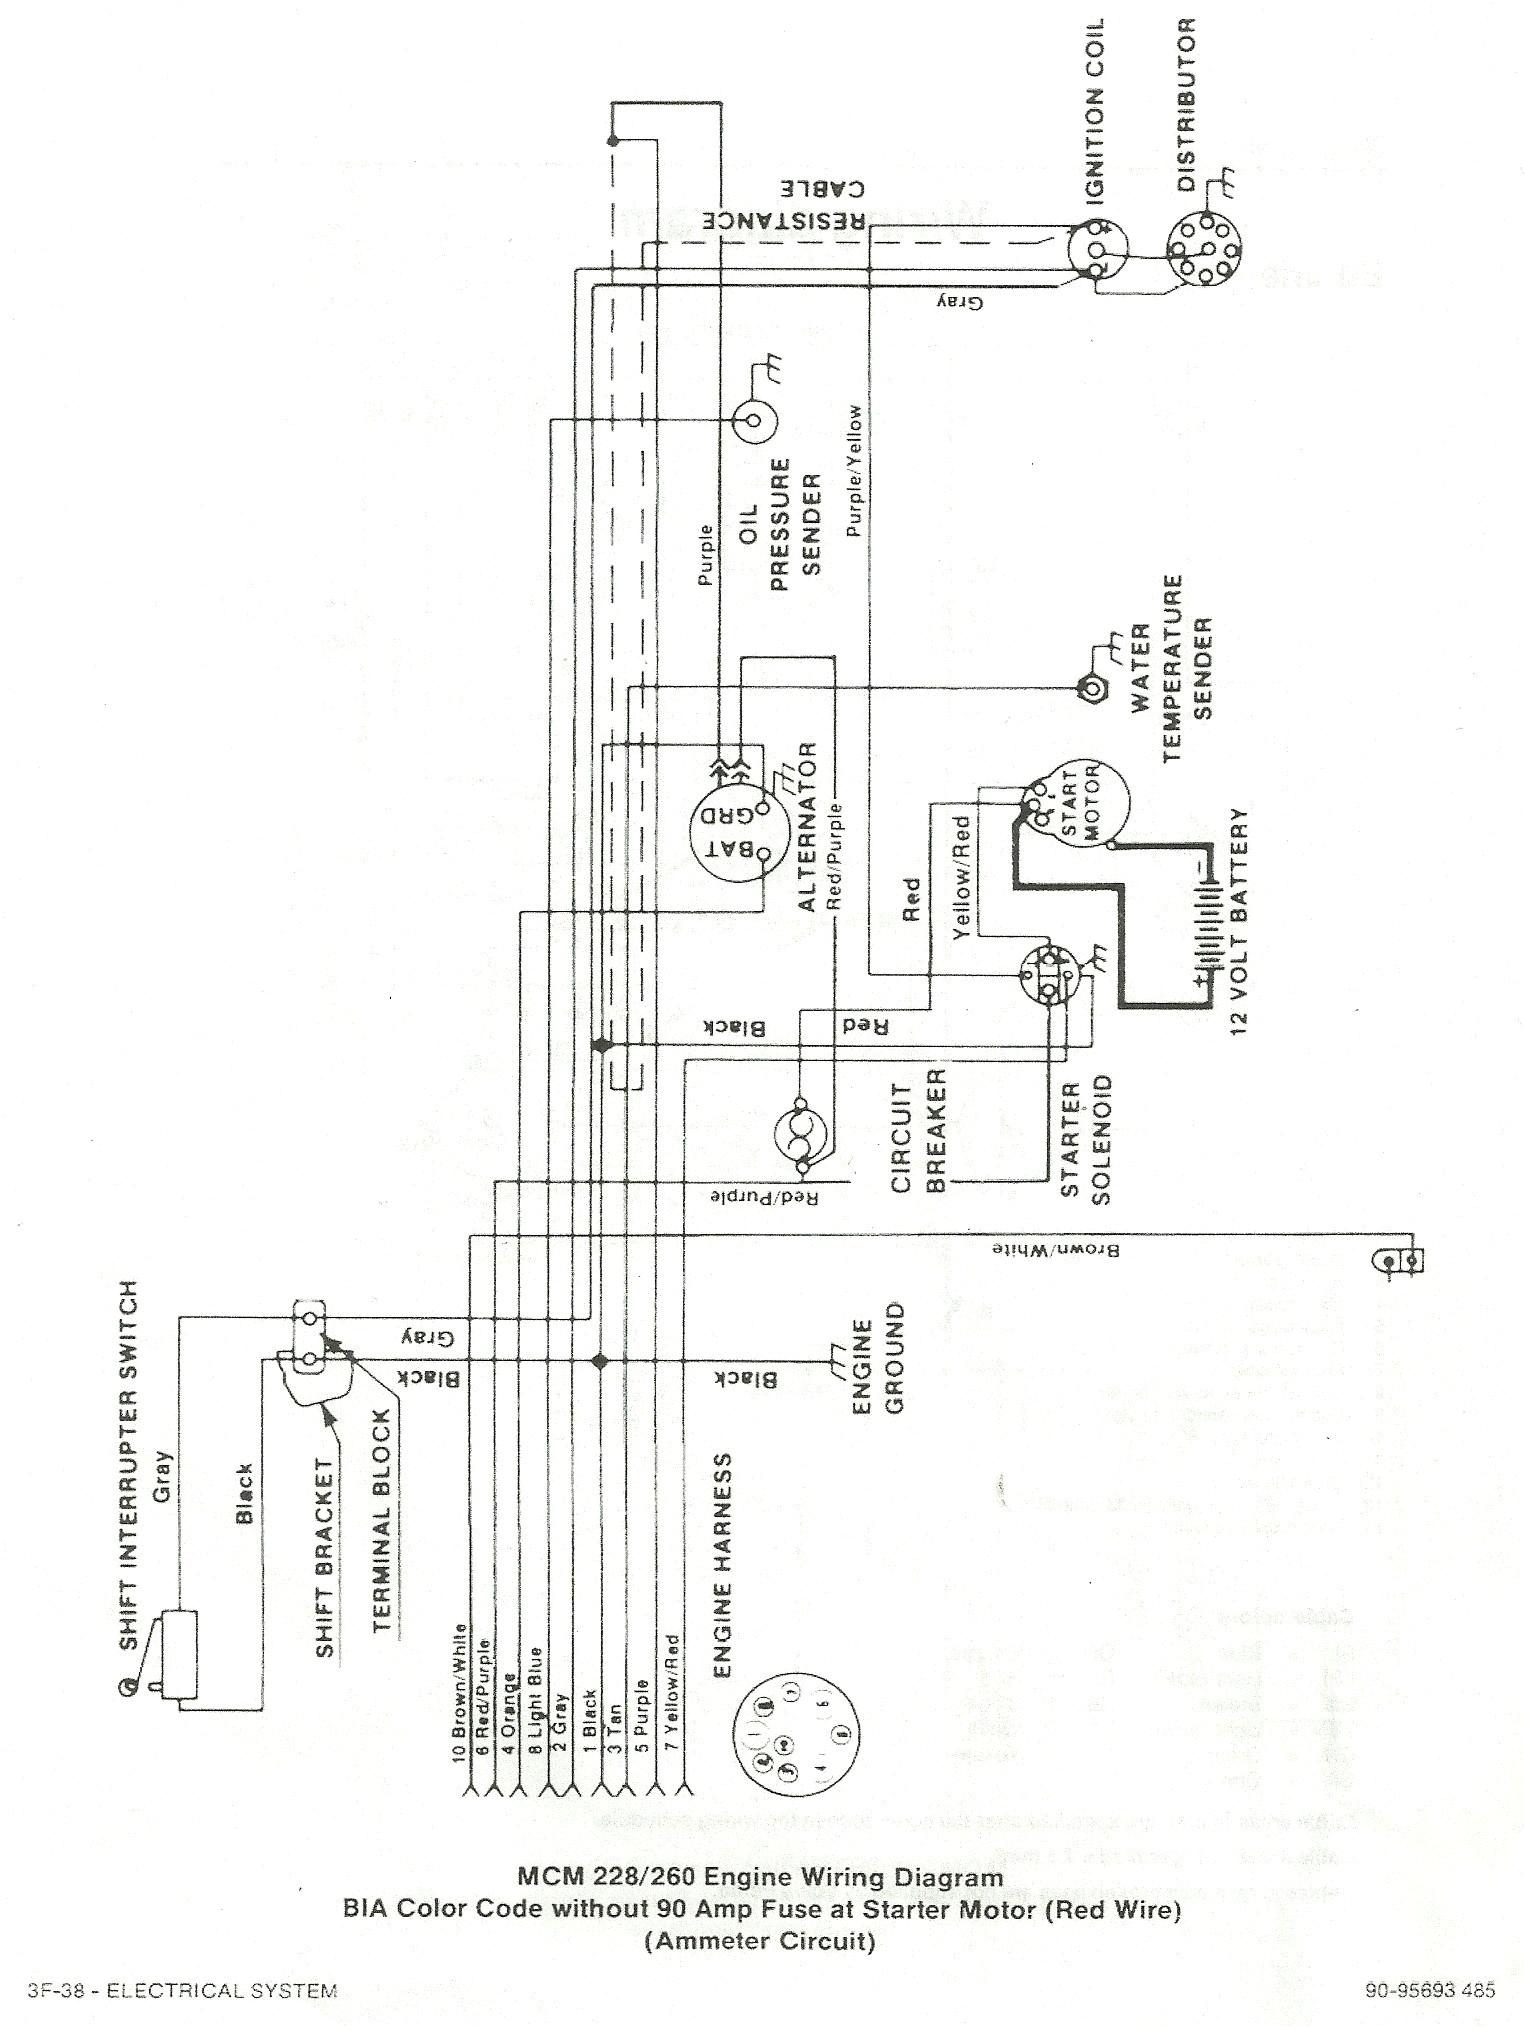 4 3 mercruiser wiring diagram color code wiring diagrams structure 4 3 mercruiser wiring diagram color code